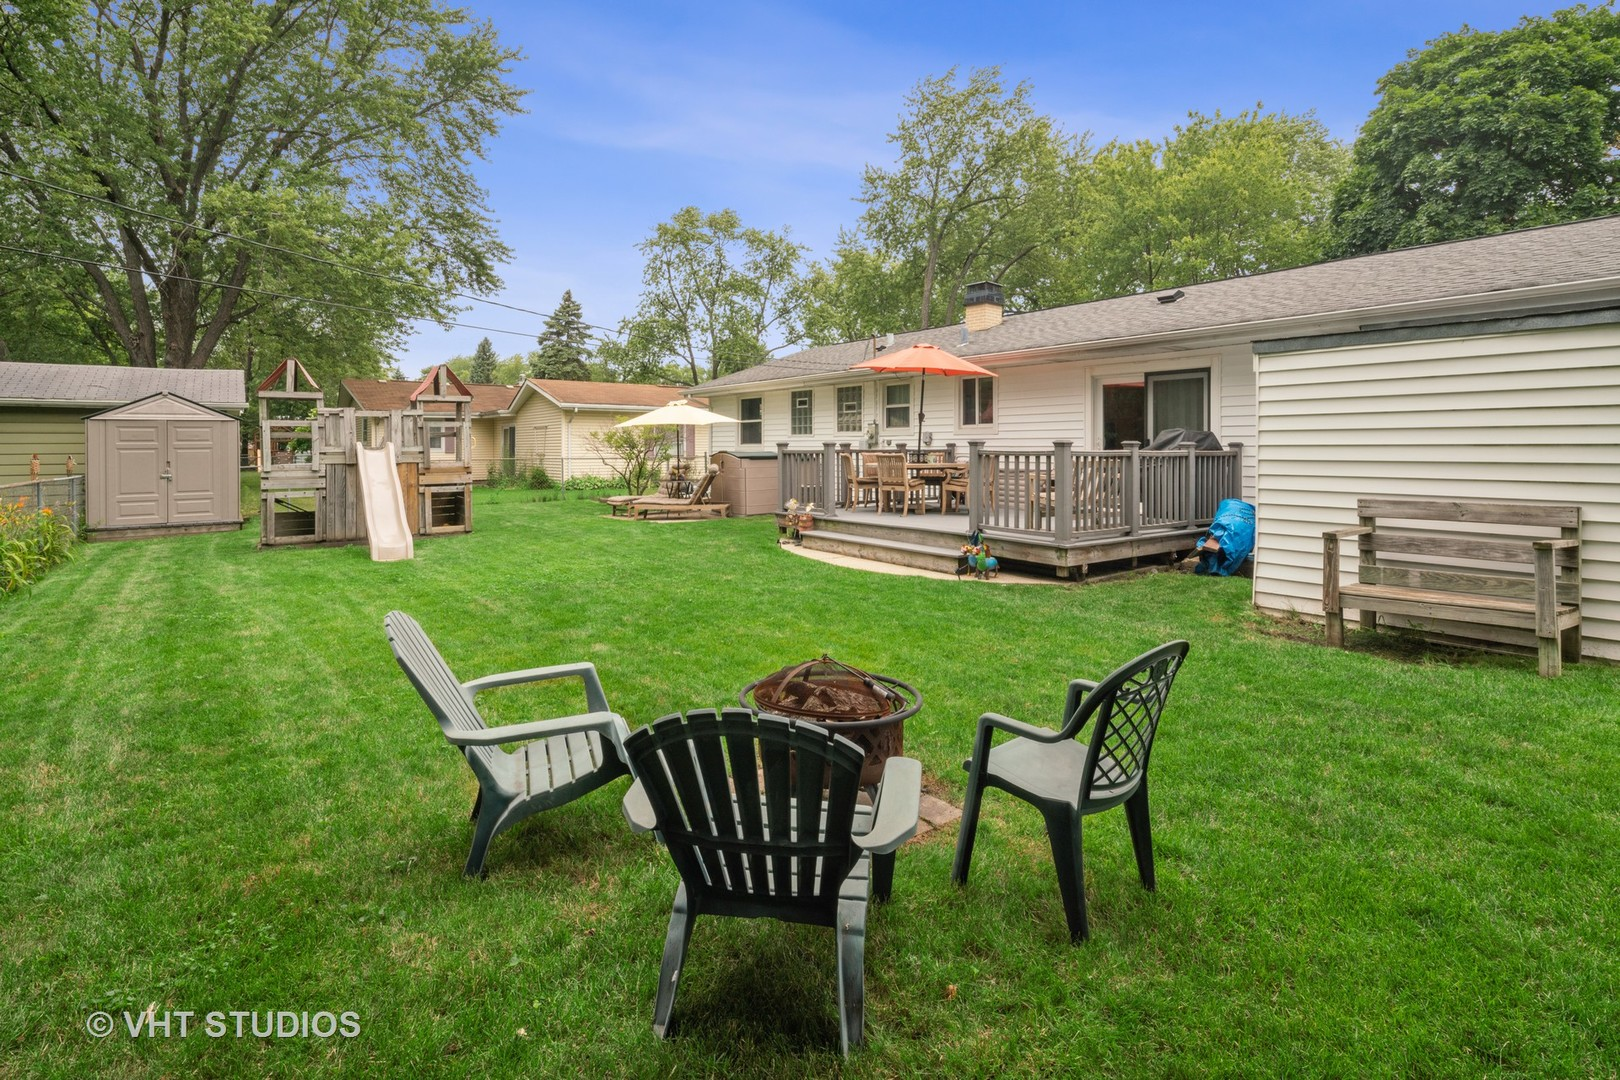 268 Tomahawk, Carol Stream, Illinois, 60188